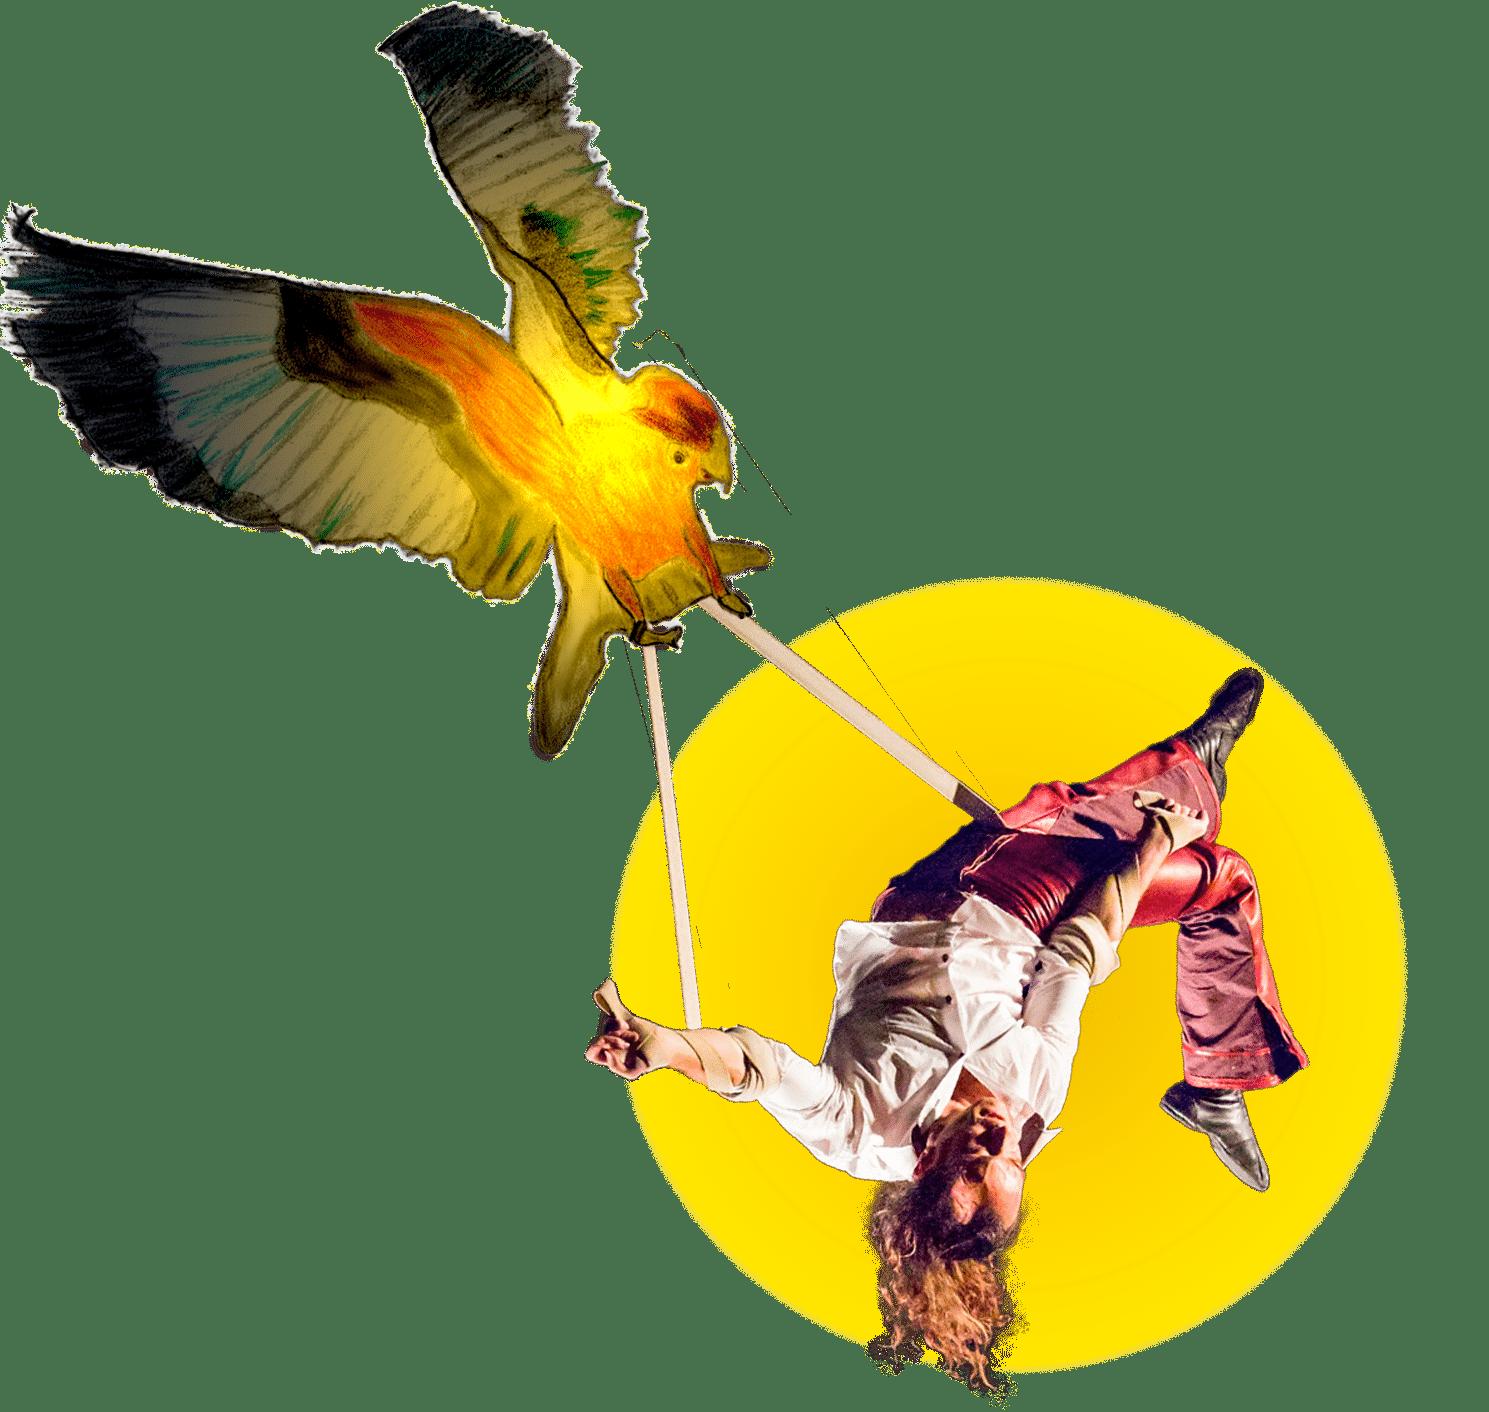 Rocco Le Flem - Artiste de cirque